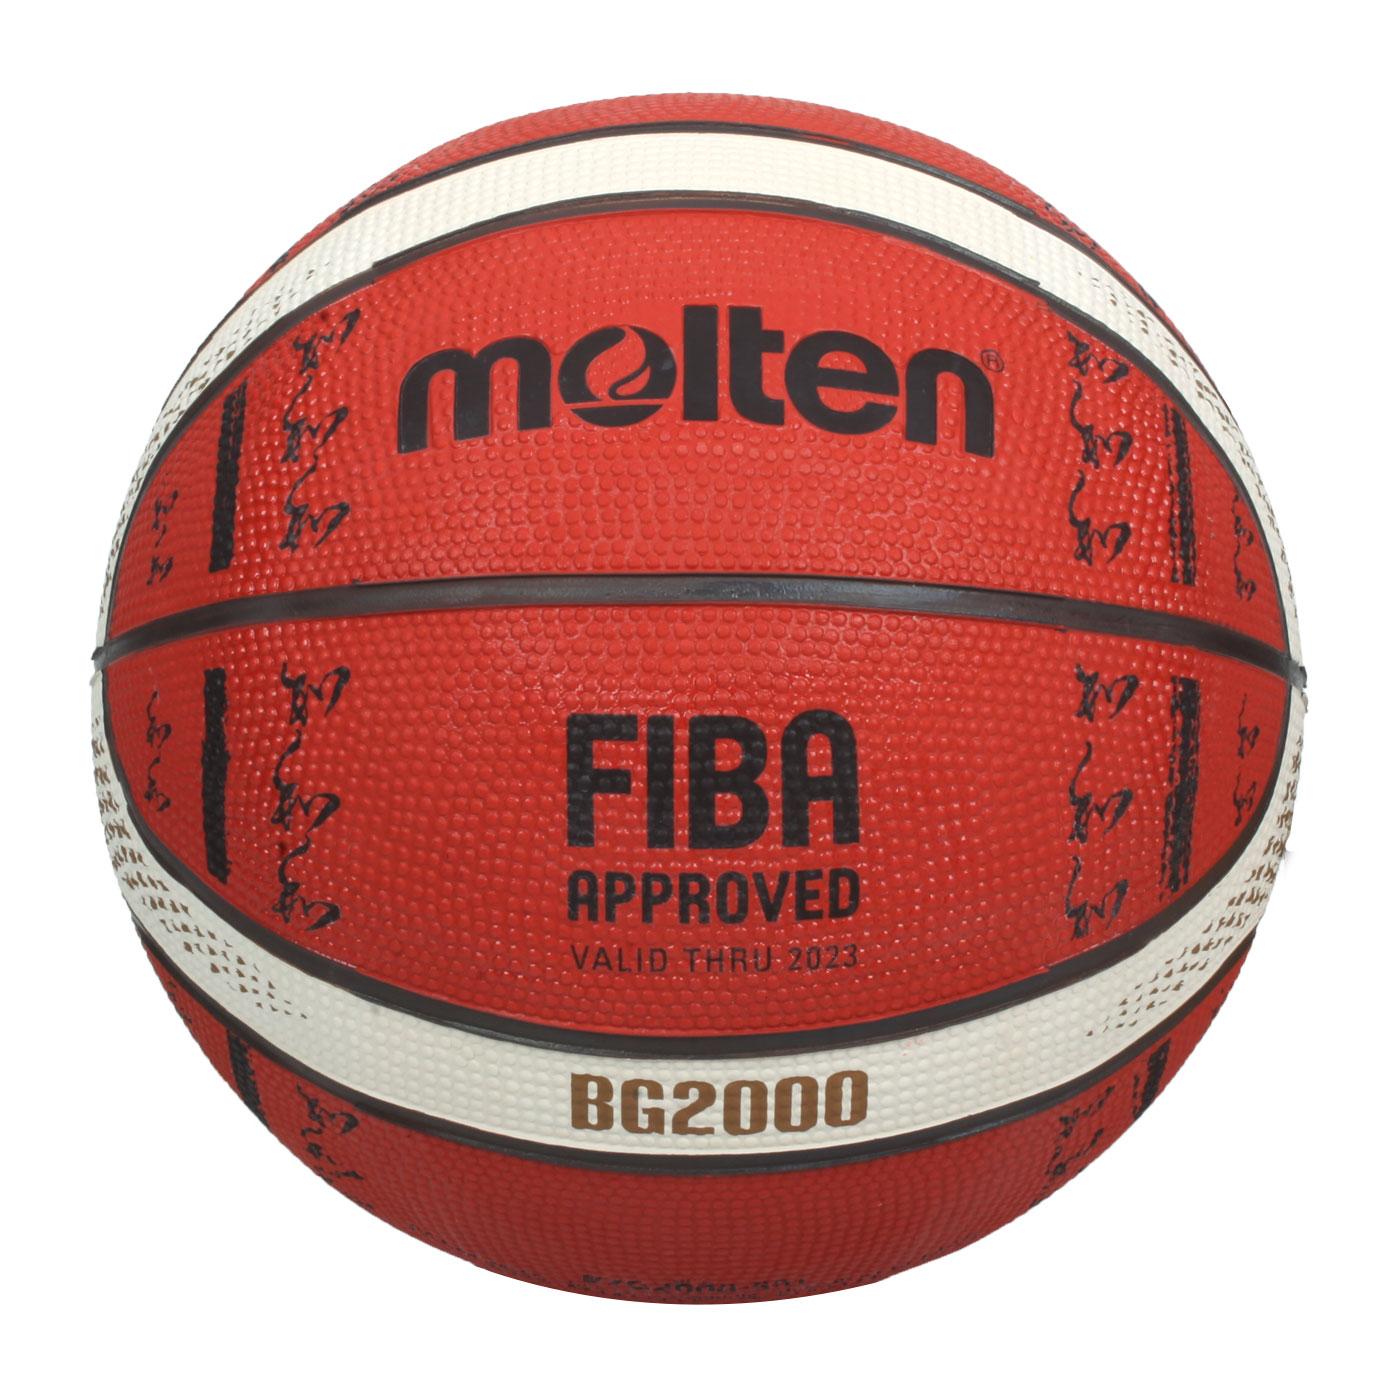 Molten 12片橡膠深溝籃球#7(2020奧運紀念球款)  B7G2000-SOJ